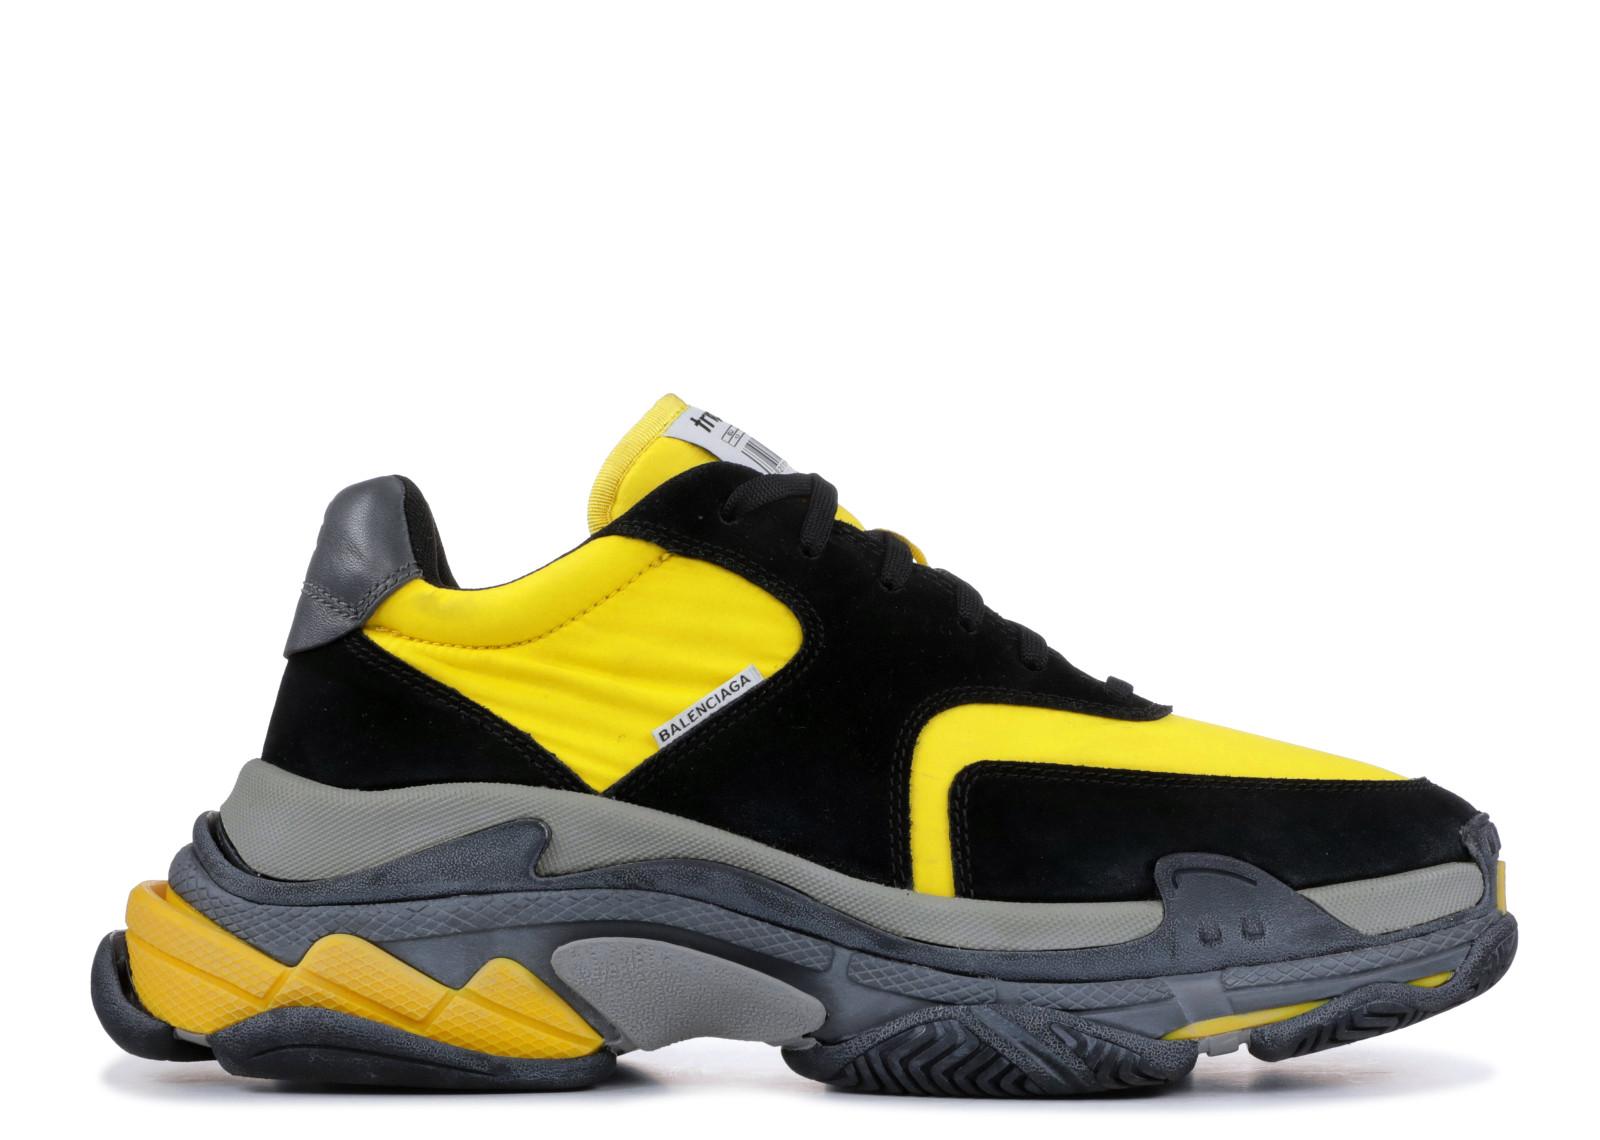 f0c468f439b6 Balenciaga Triple S Black Yellow - 0